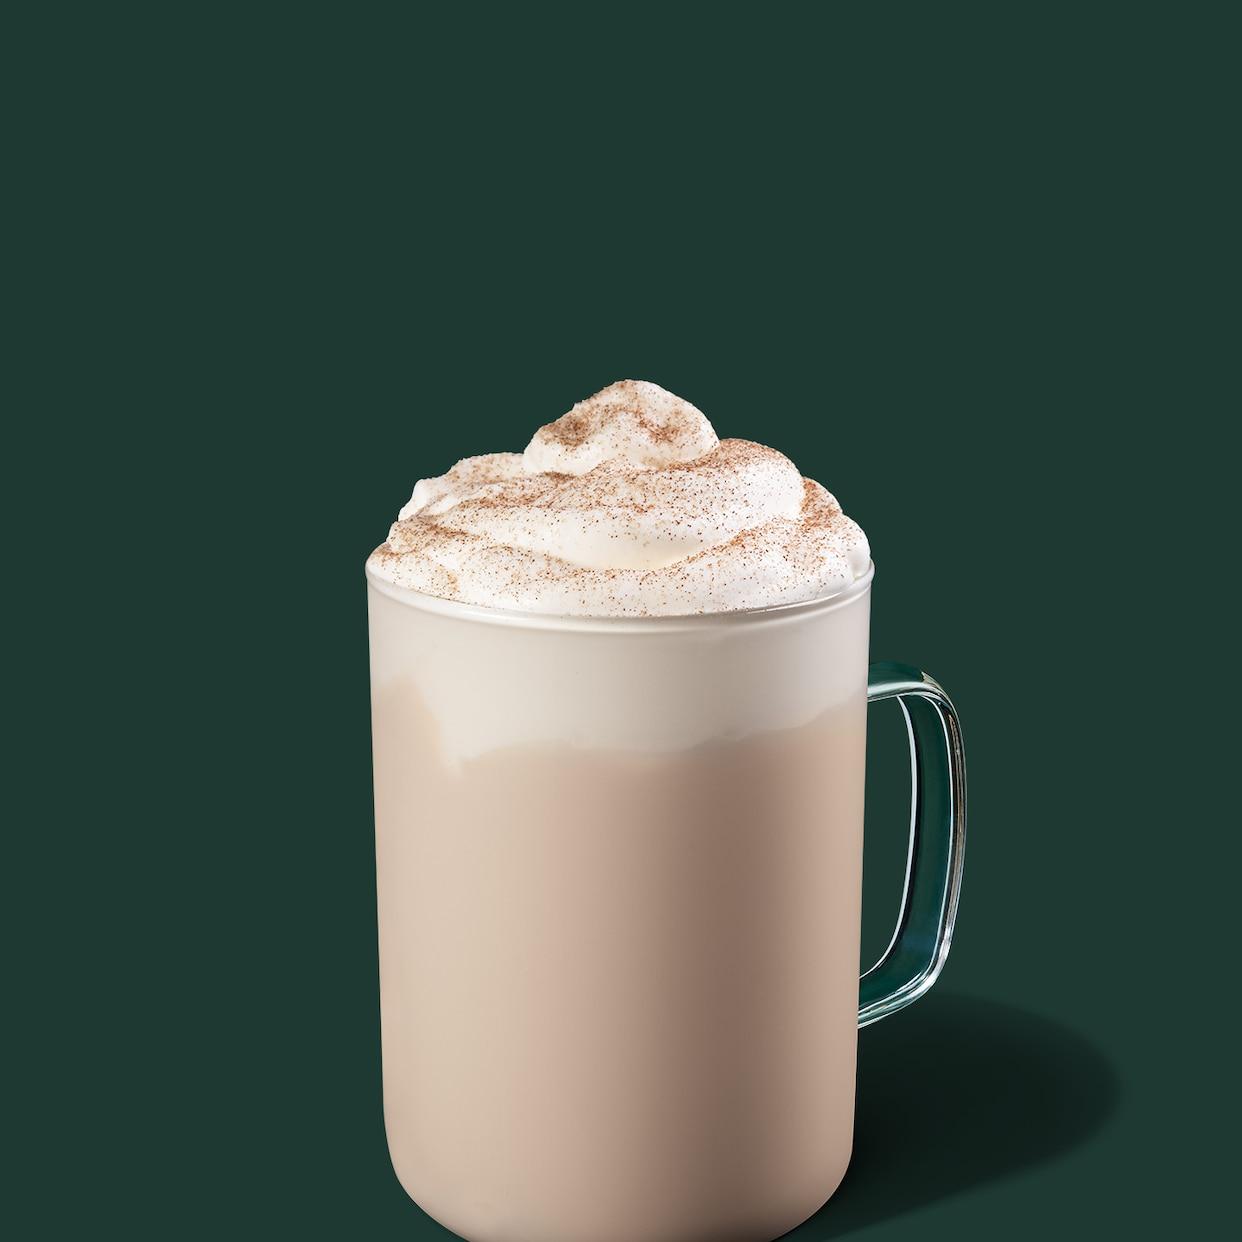 Cinnamon Dolce Creme Starbucks Coffee Company